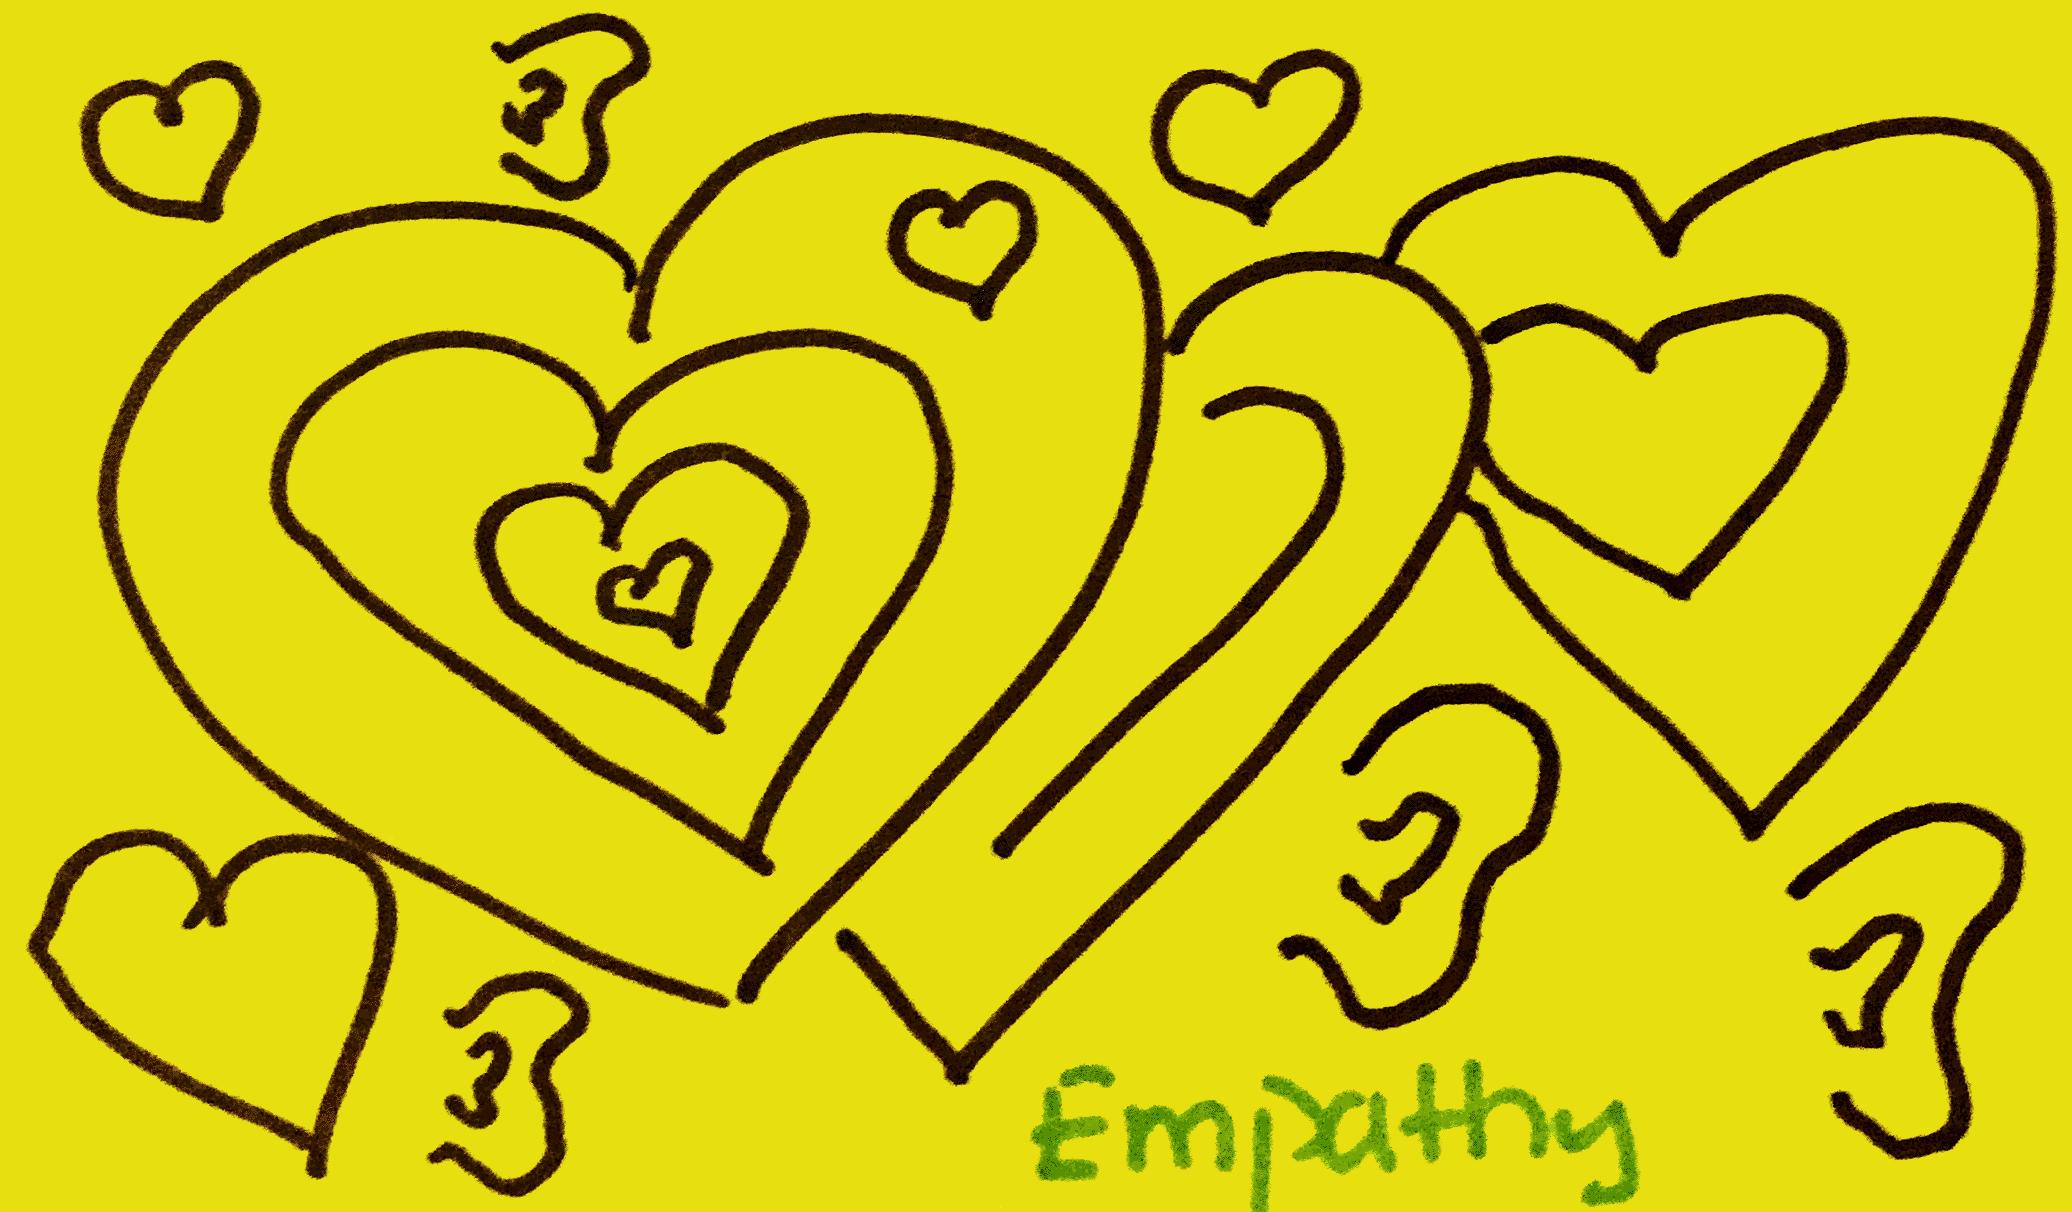 strengthsfinder-singapore-strengths-school-empathy-8